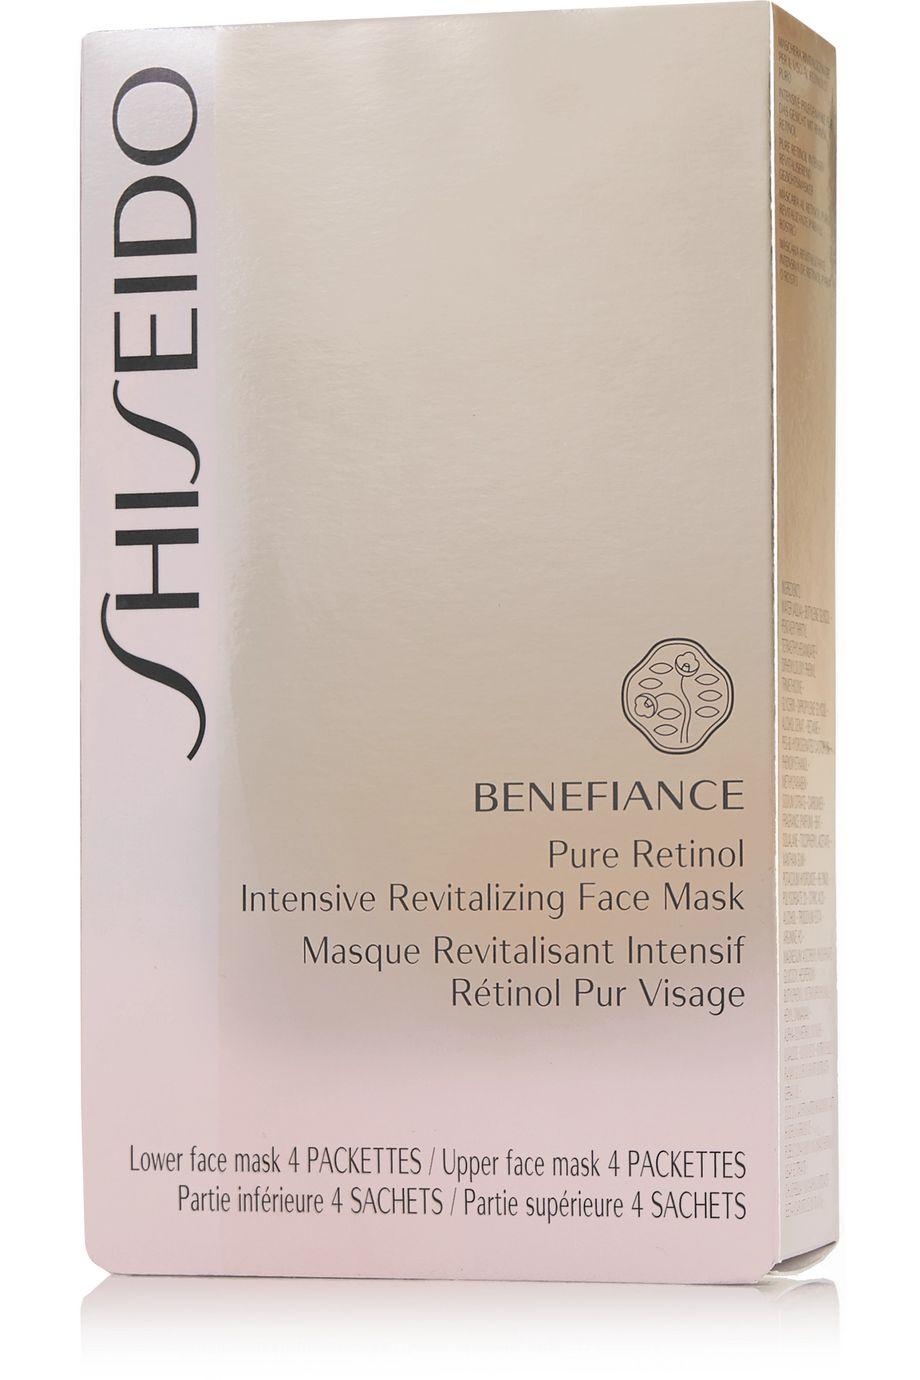 Shiseido Benefiance Pure Retinol Intensive Revitalizing Face Mask  – 4 Stück – Gesichtsmasken